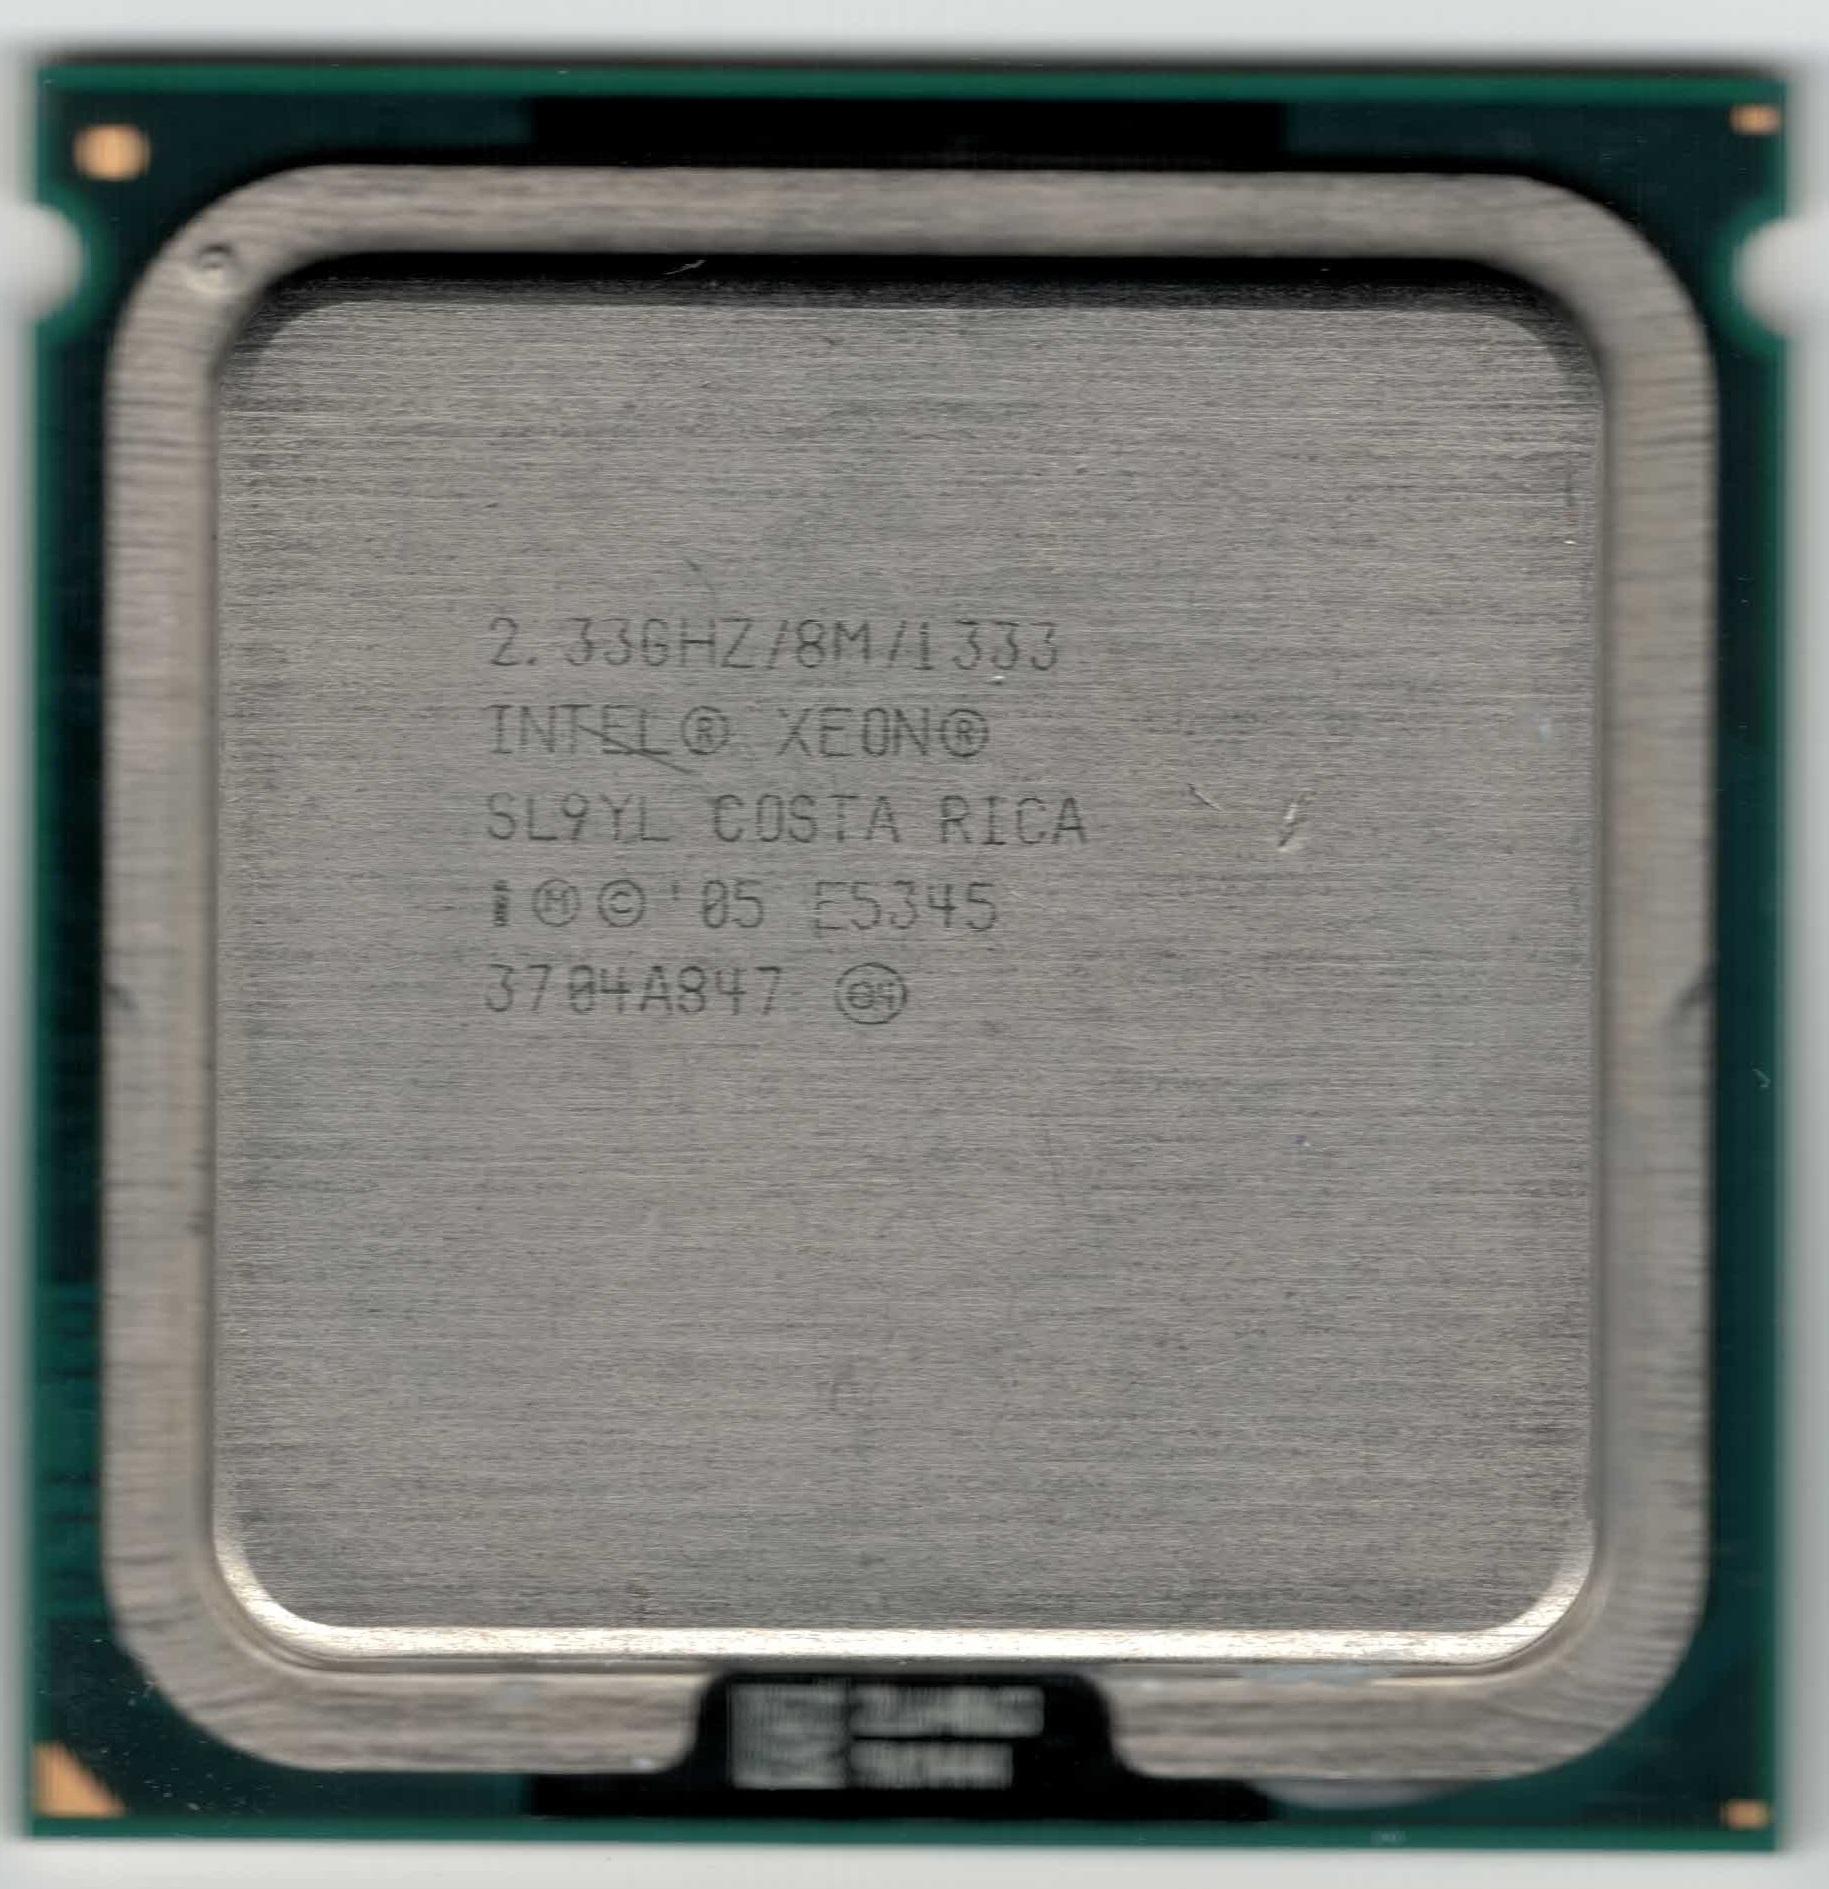 Procesor Intel Xeon Processor E5345 4M 2.33 GHz